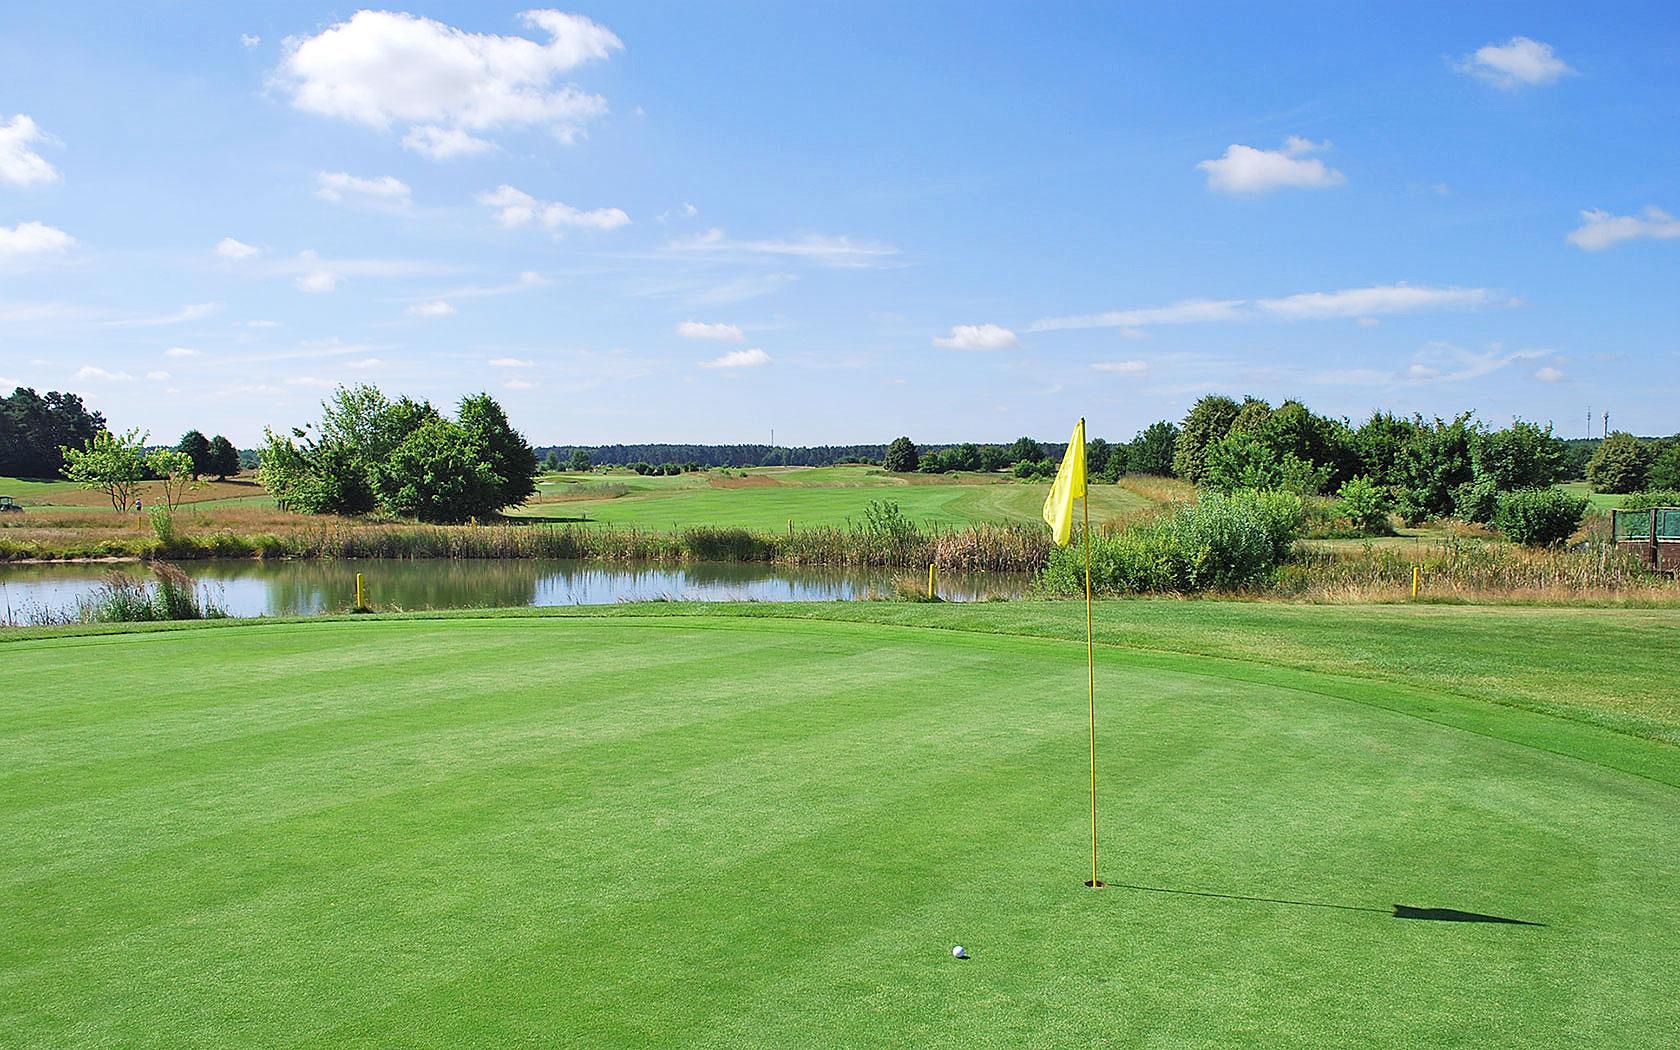 Golfclub Berlin Prenden - Golfclub in Prenden